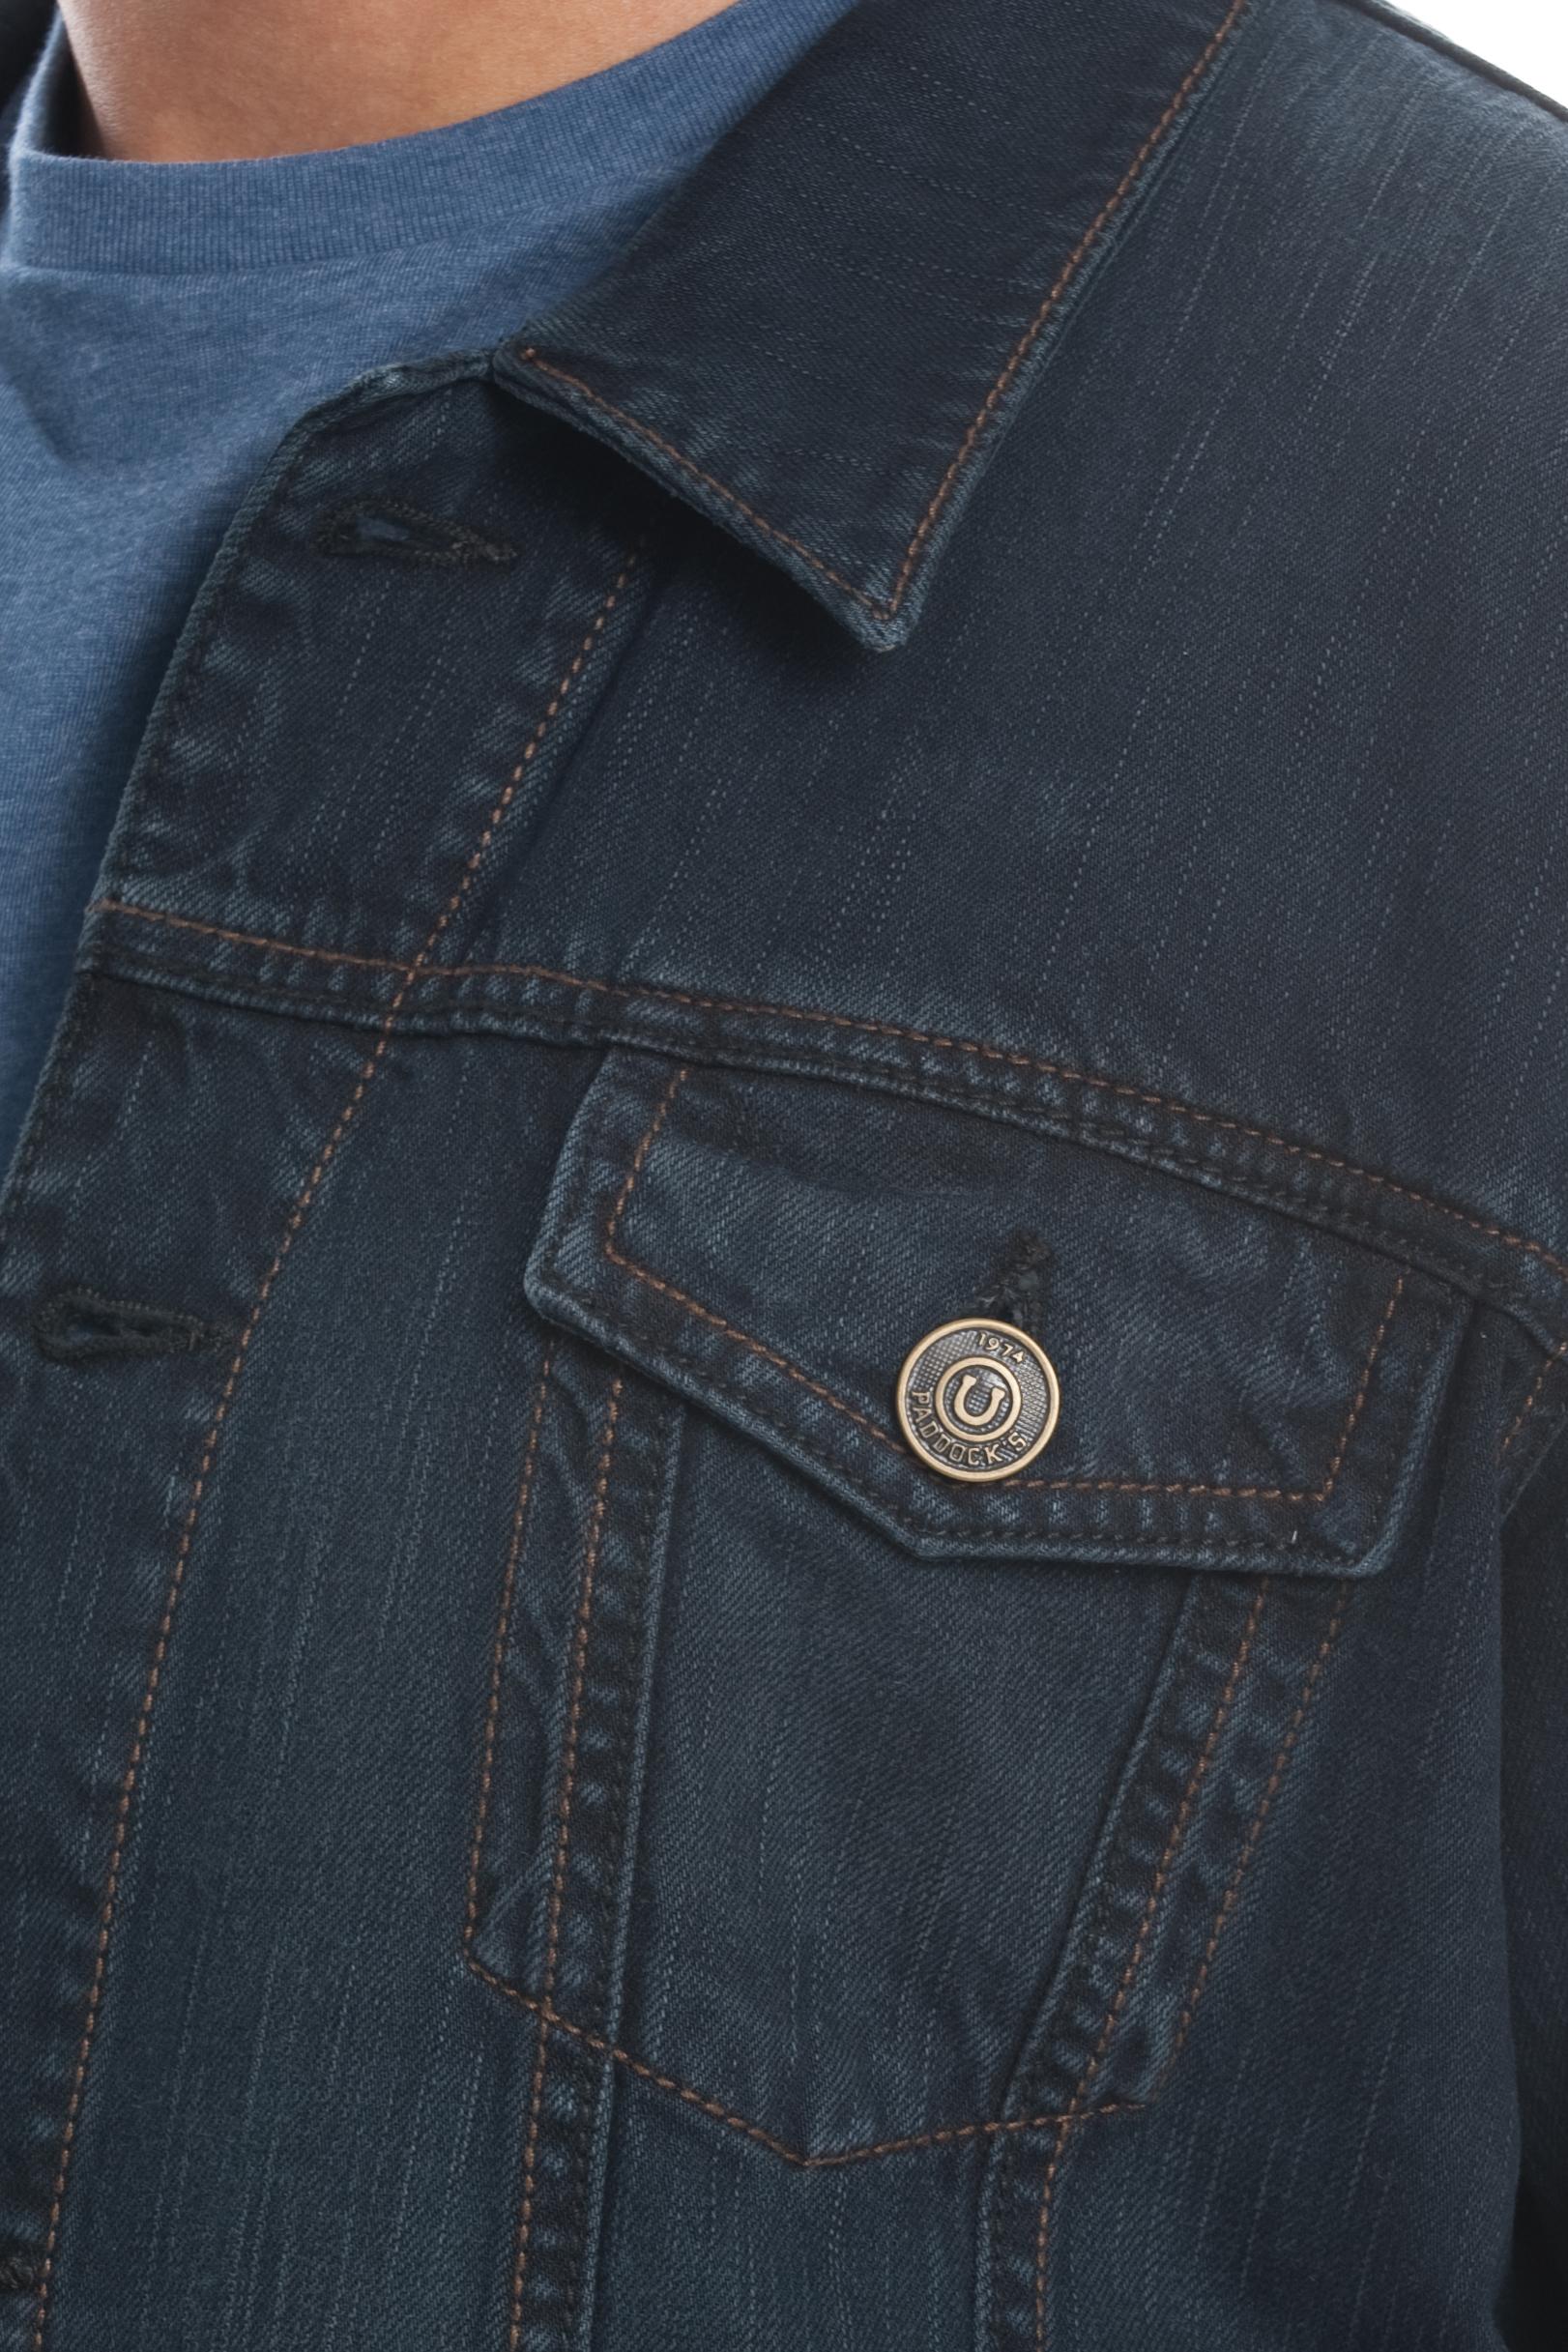 Paddock's Western Jacket